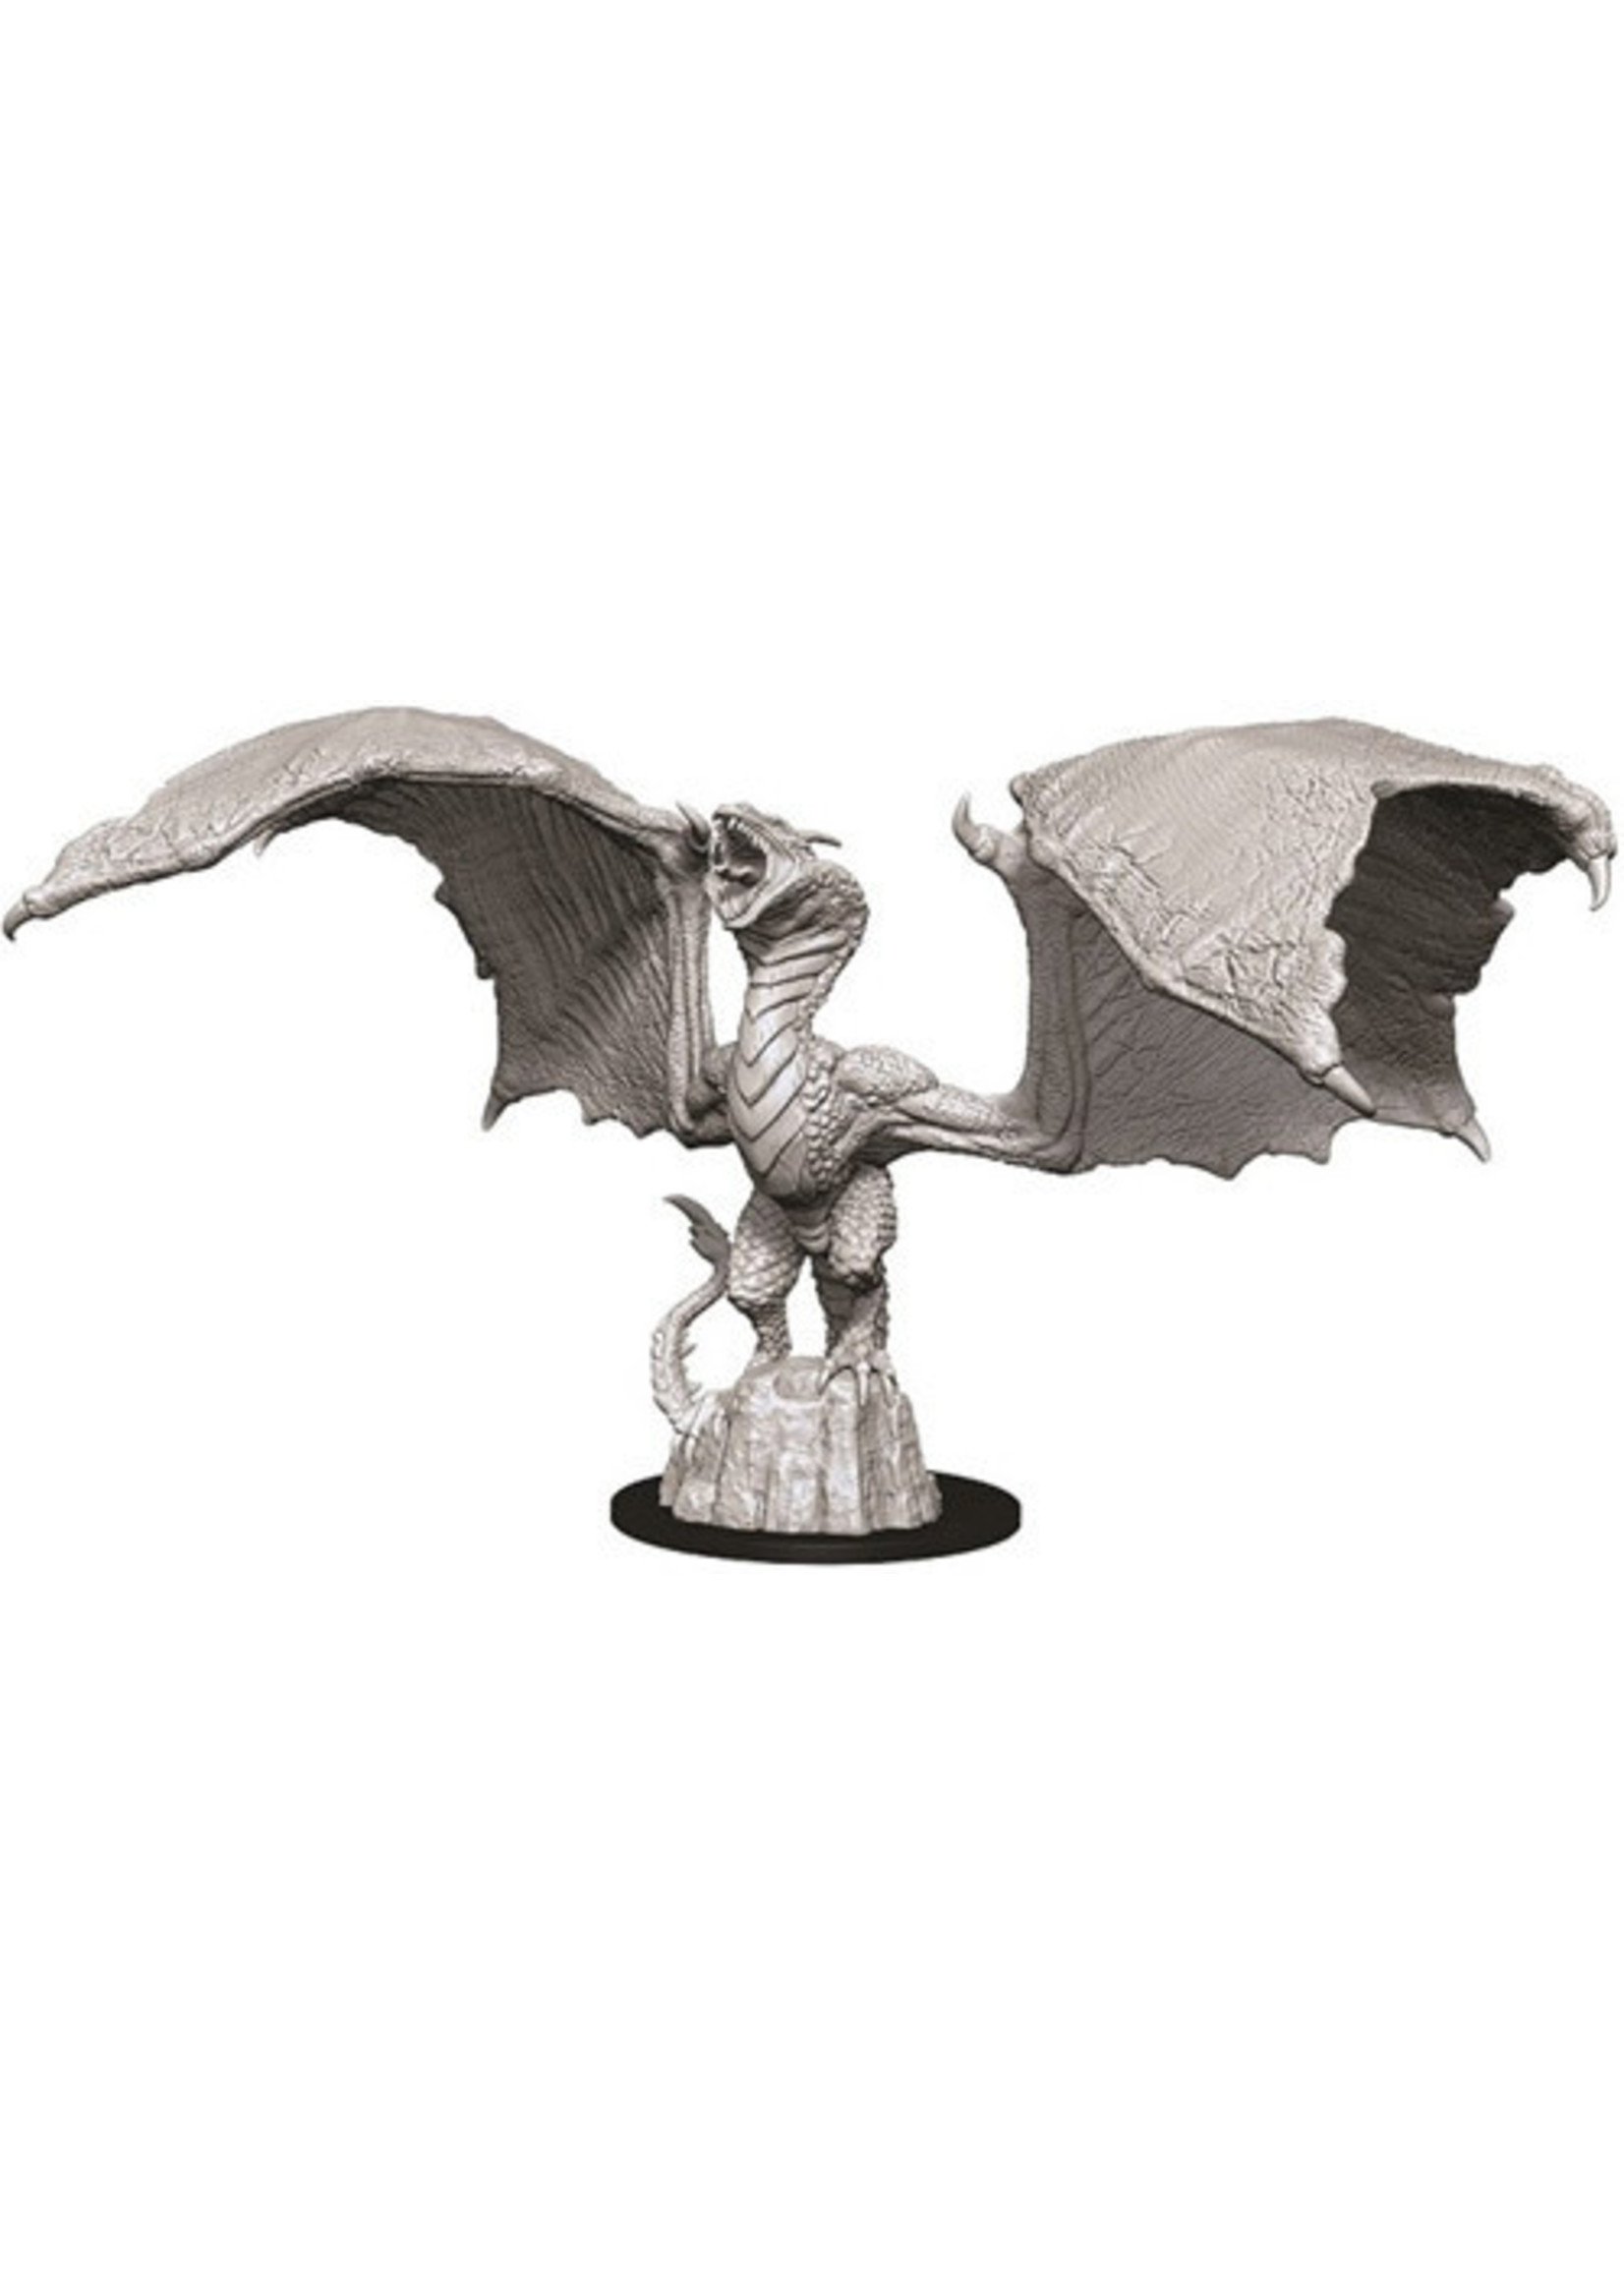 Dungeons & Dragons Nolzur`s Marvelous Unpainted Miniatures: W9 Wyvern